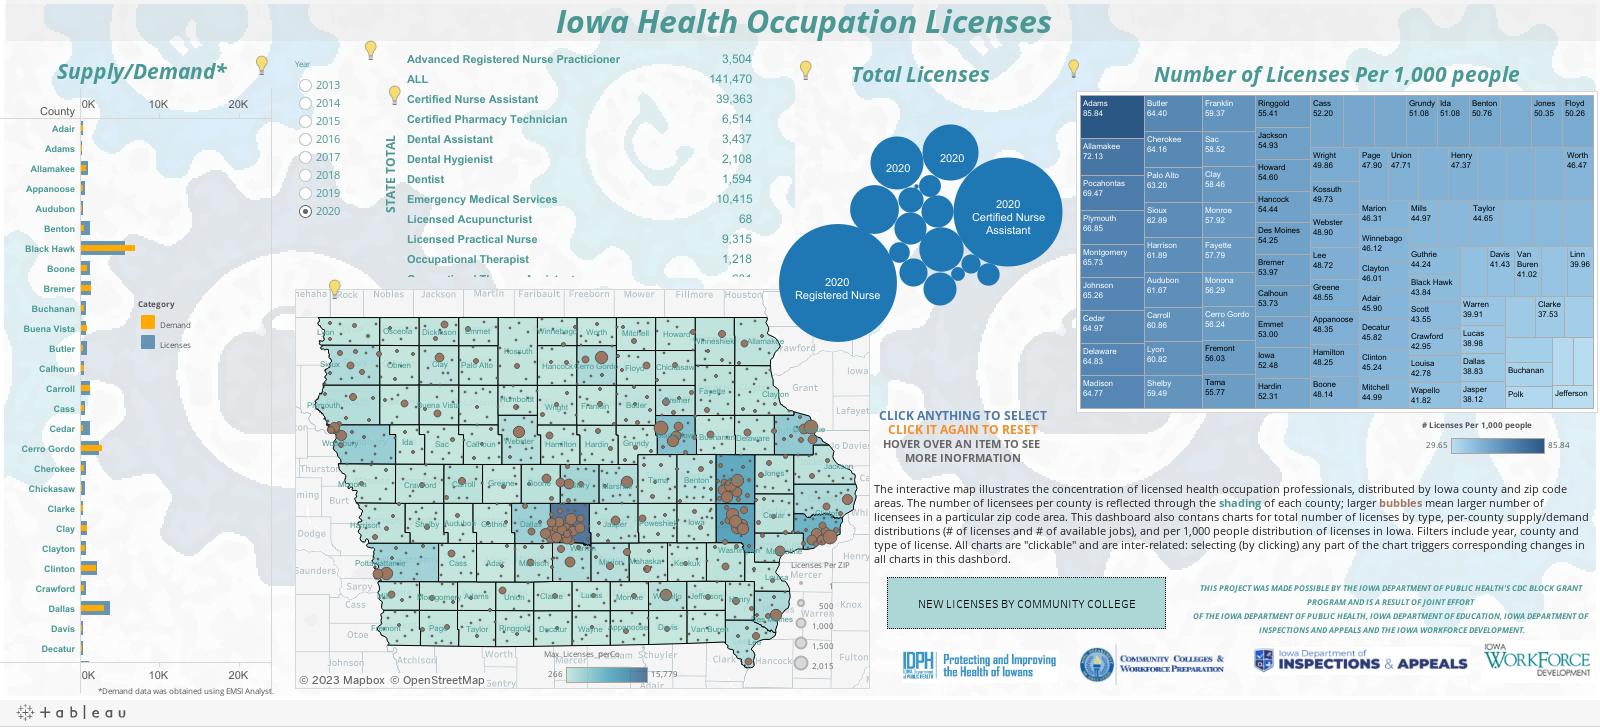 Iowa Registered Apprenticeship Sponsors and Employment Demand